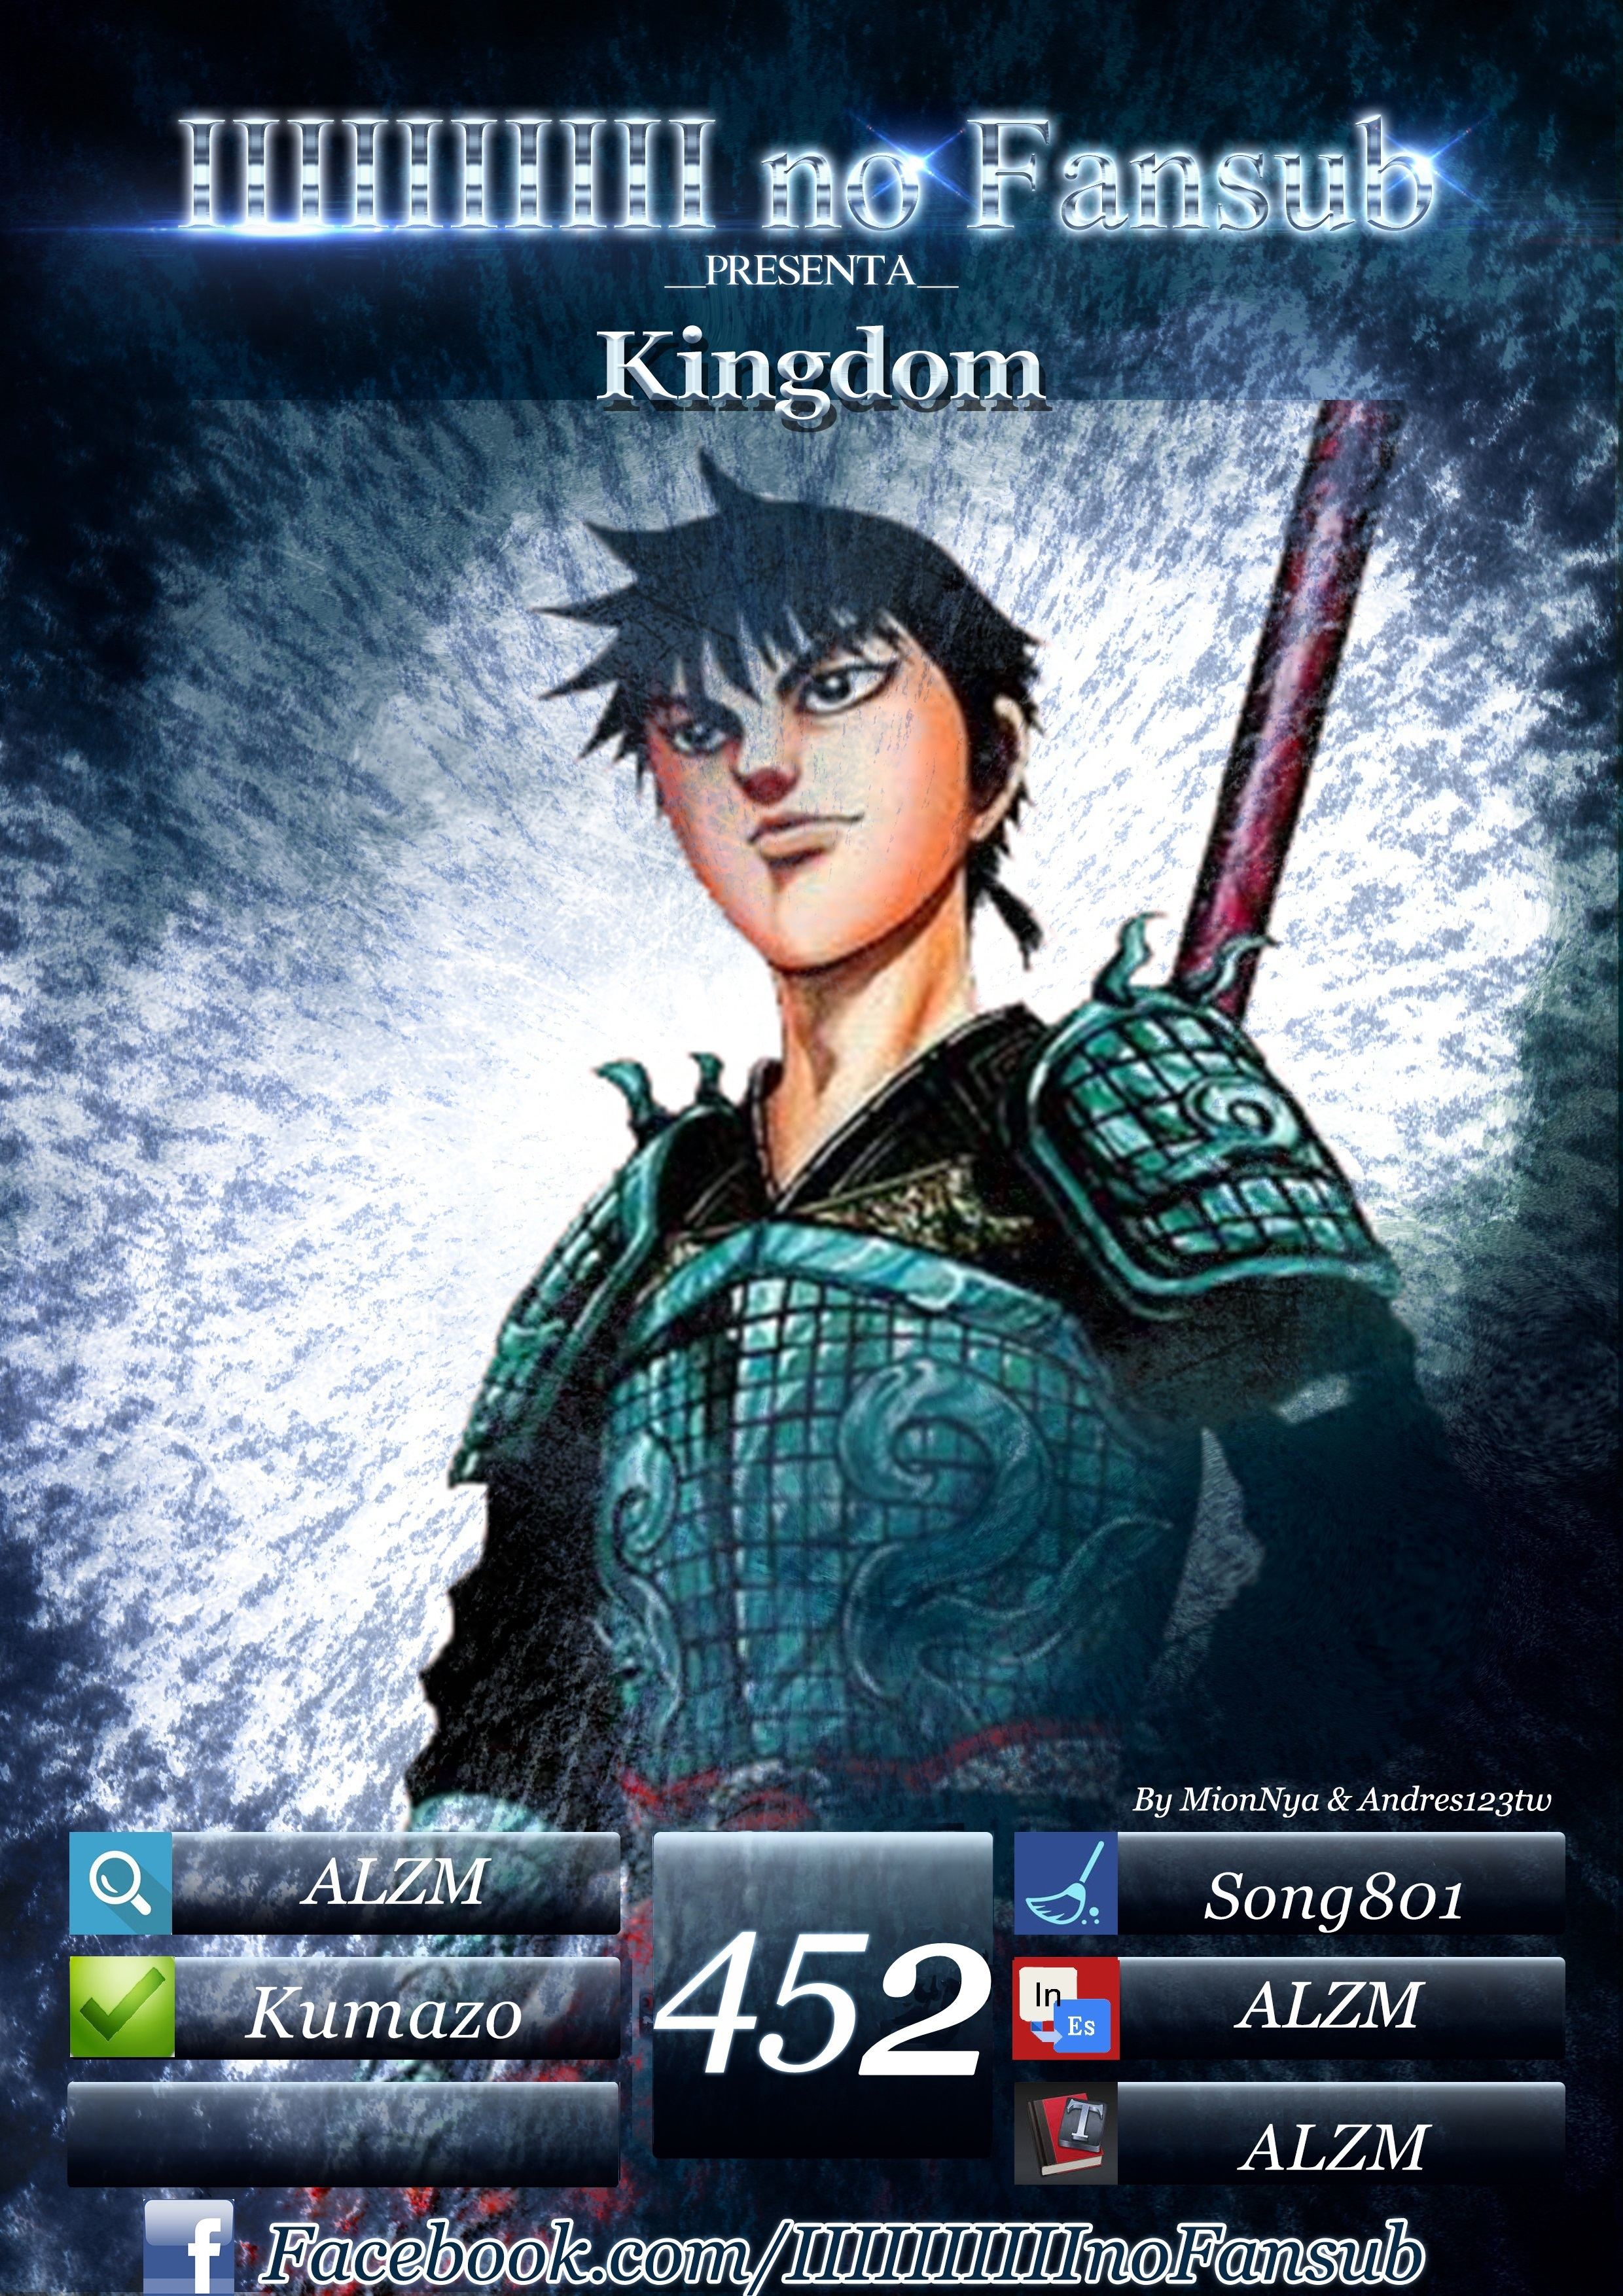 http://c5.ninemanga.com/es_manga/19/12307/429520/5f3c24304aafba0152abbc39fe39aebe.jpg Page 1